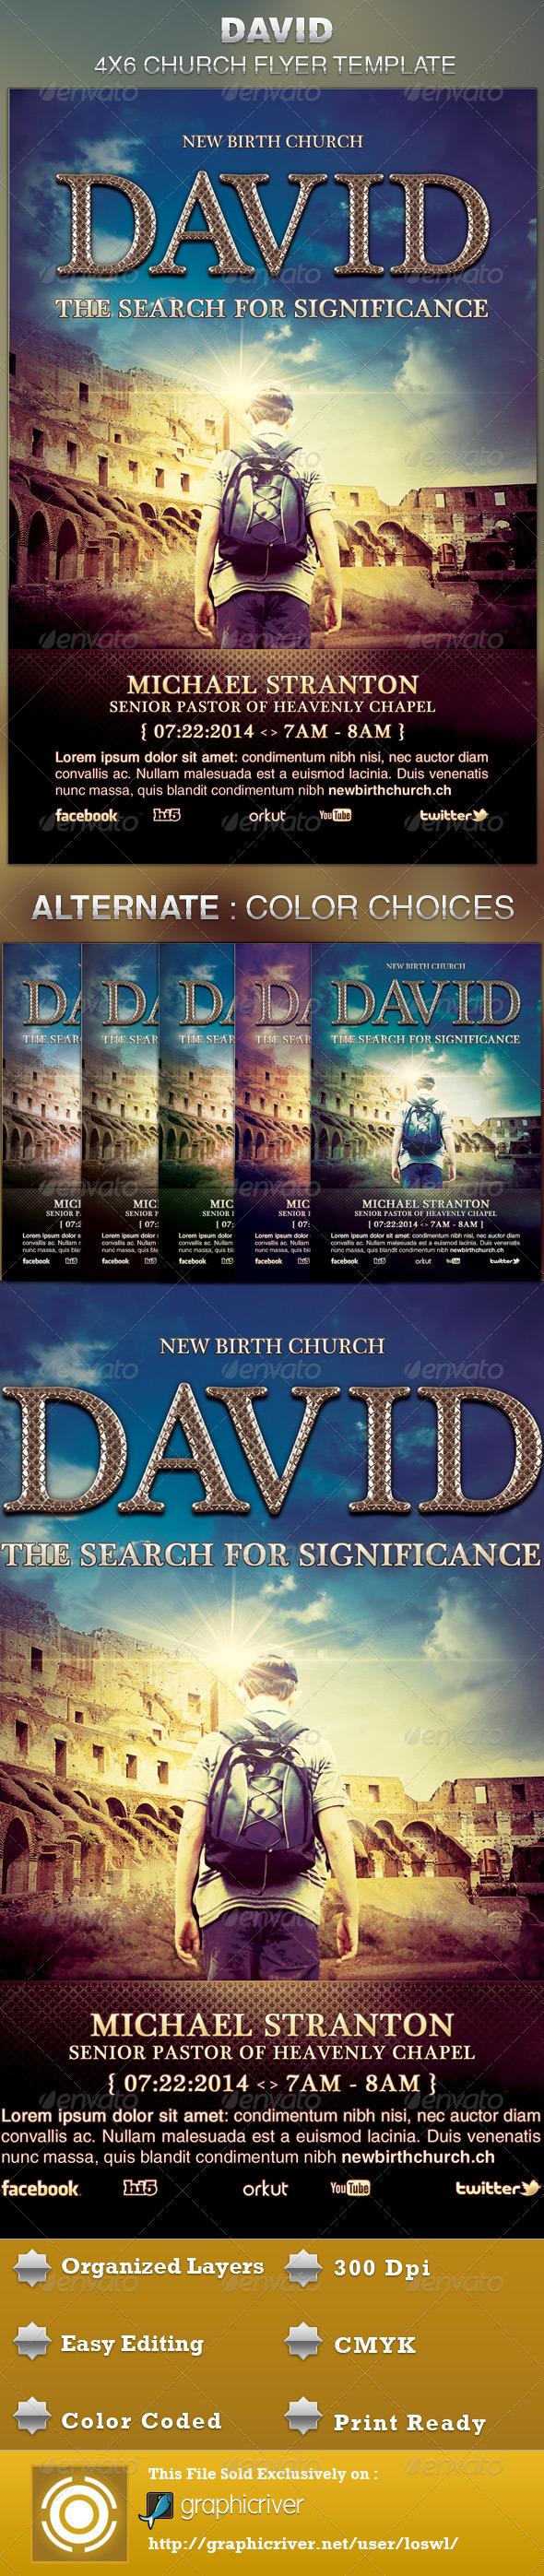 GraphicRiver David Church Flyer Template 5172859